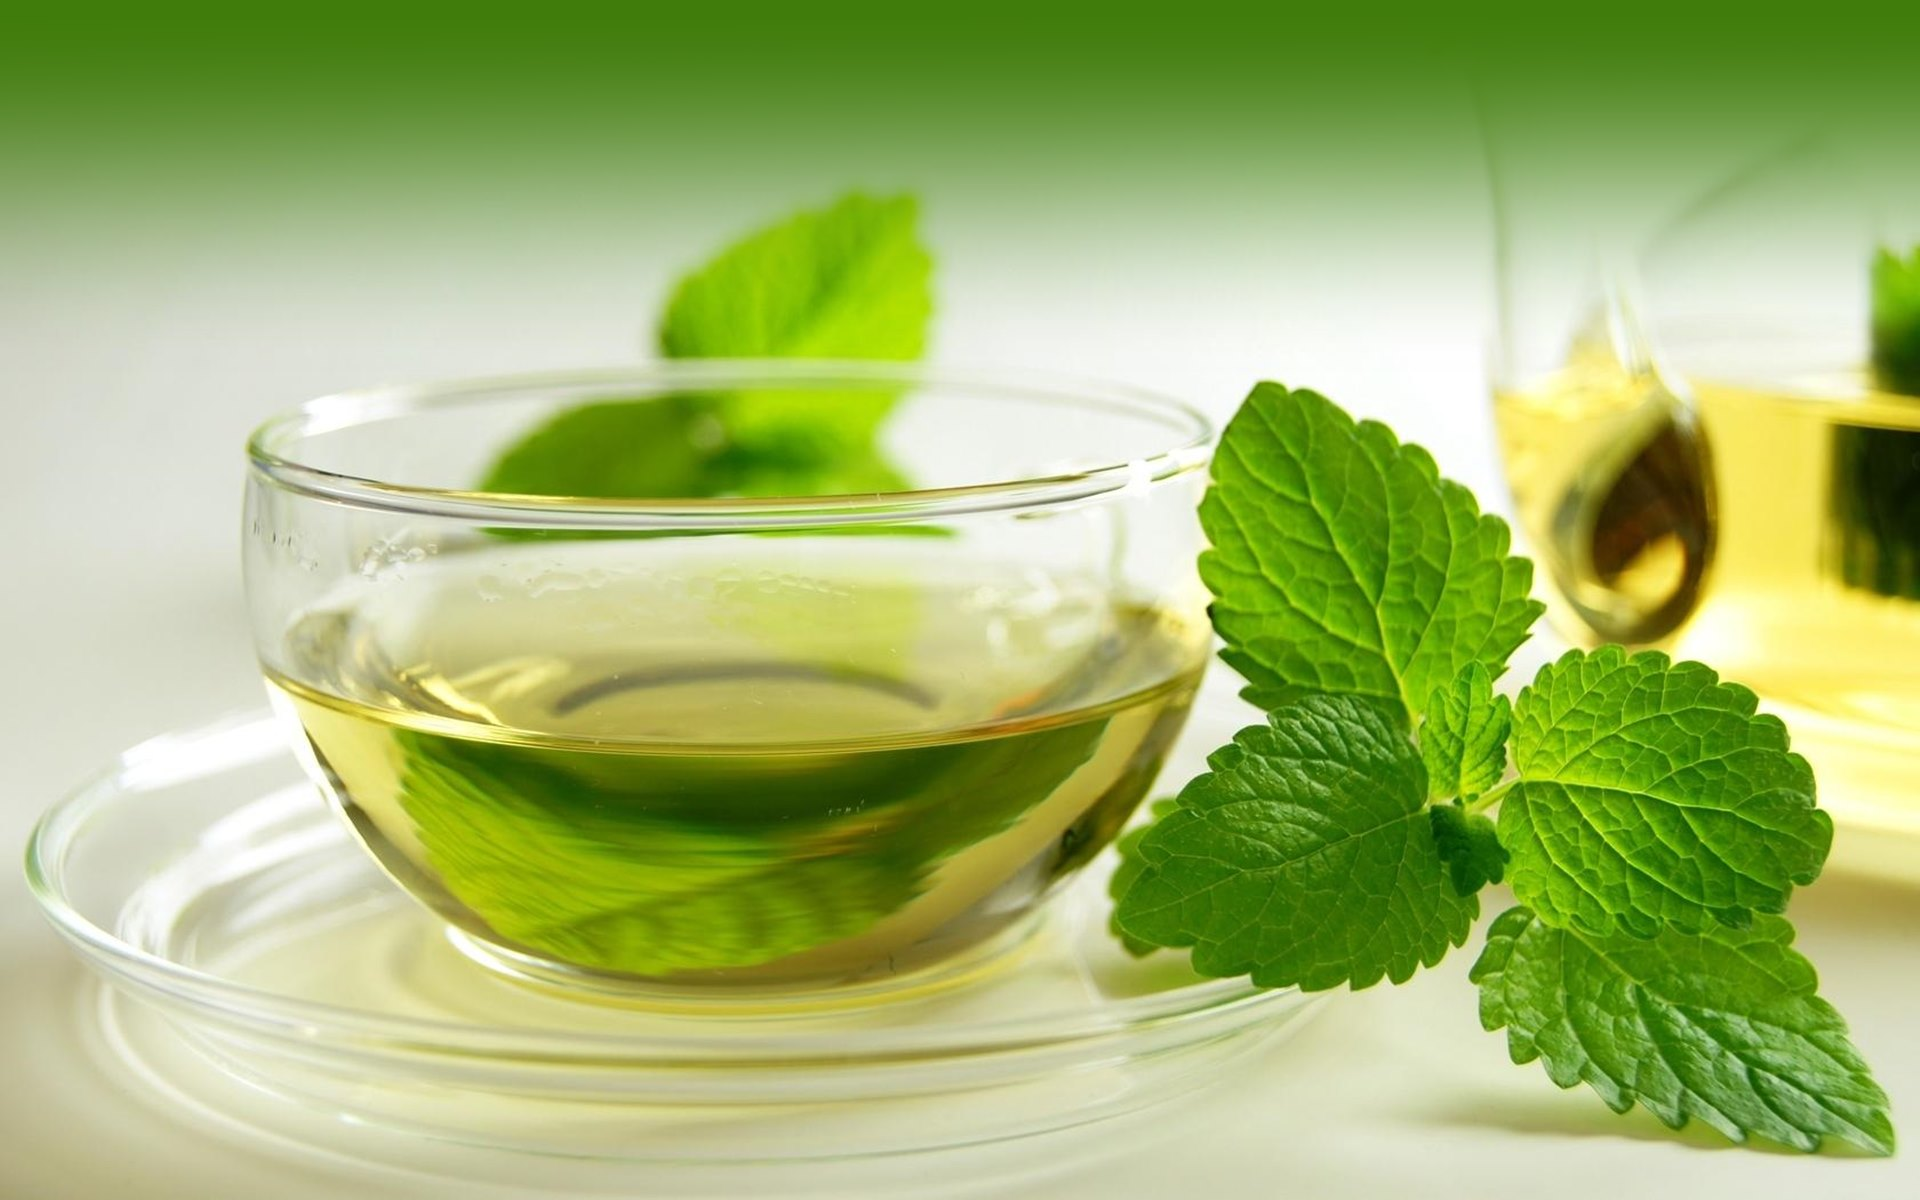 Image result for green tea hd wallpaper